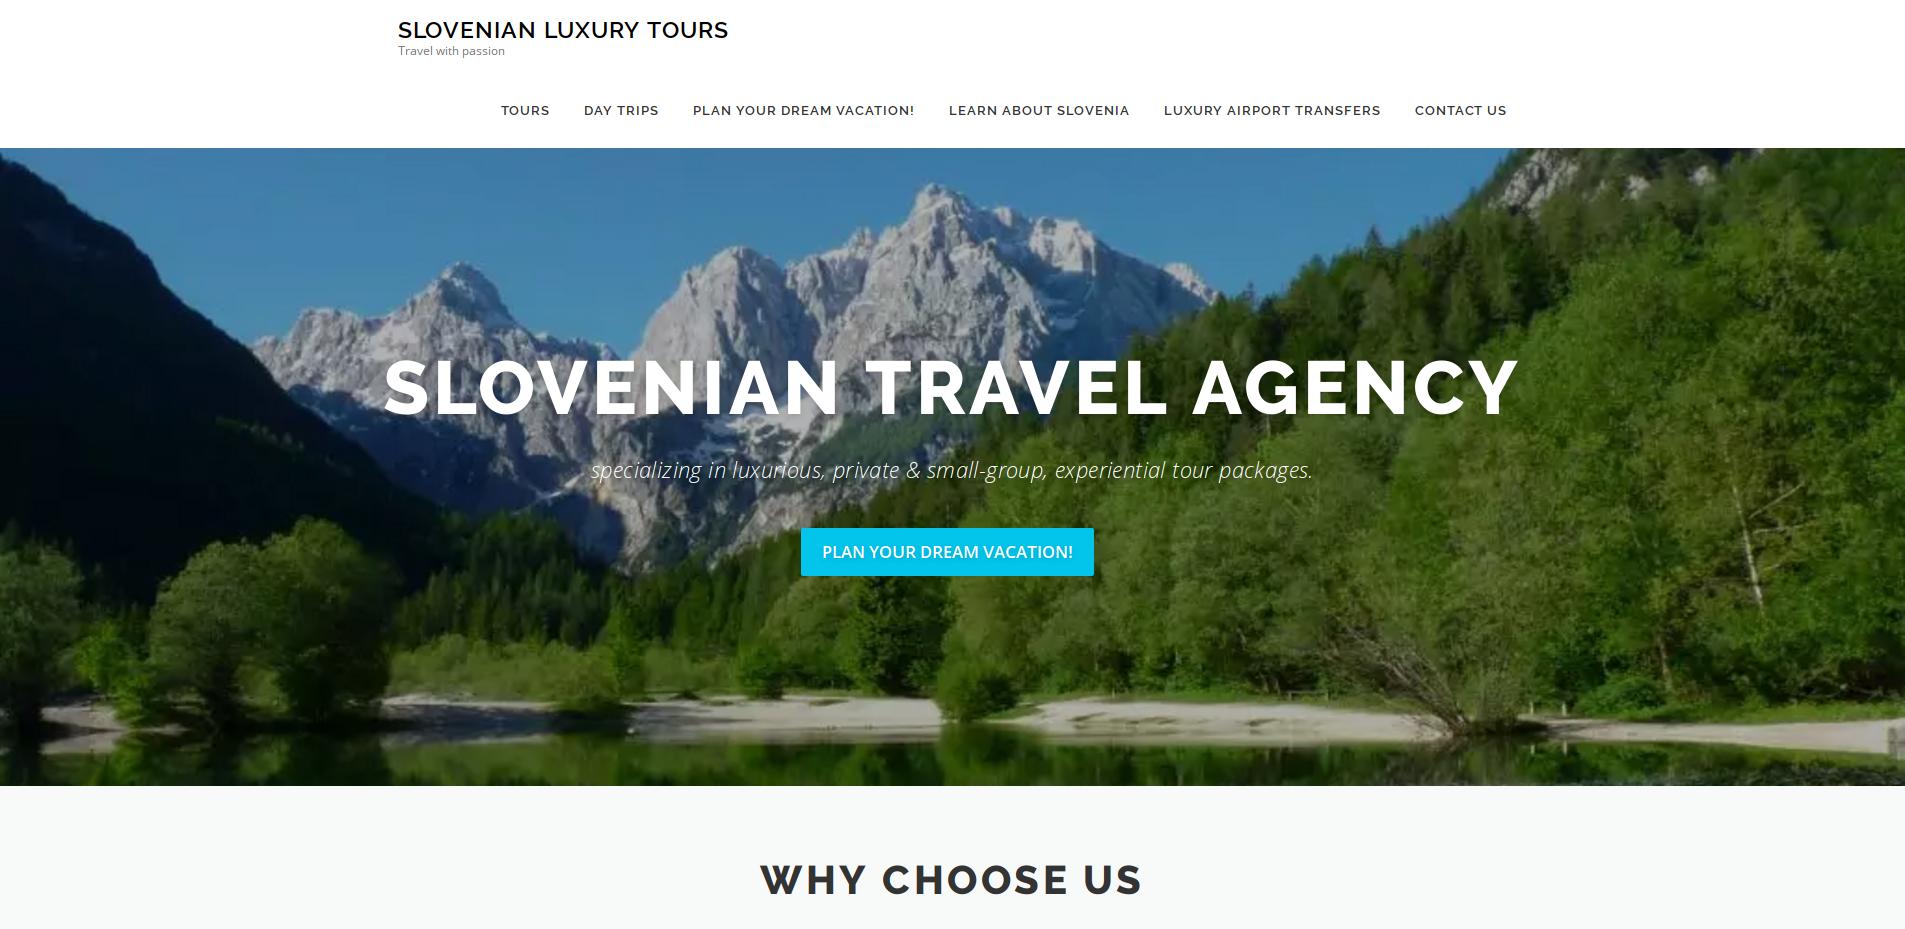 http://slovenian-luxury-tours.com/